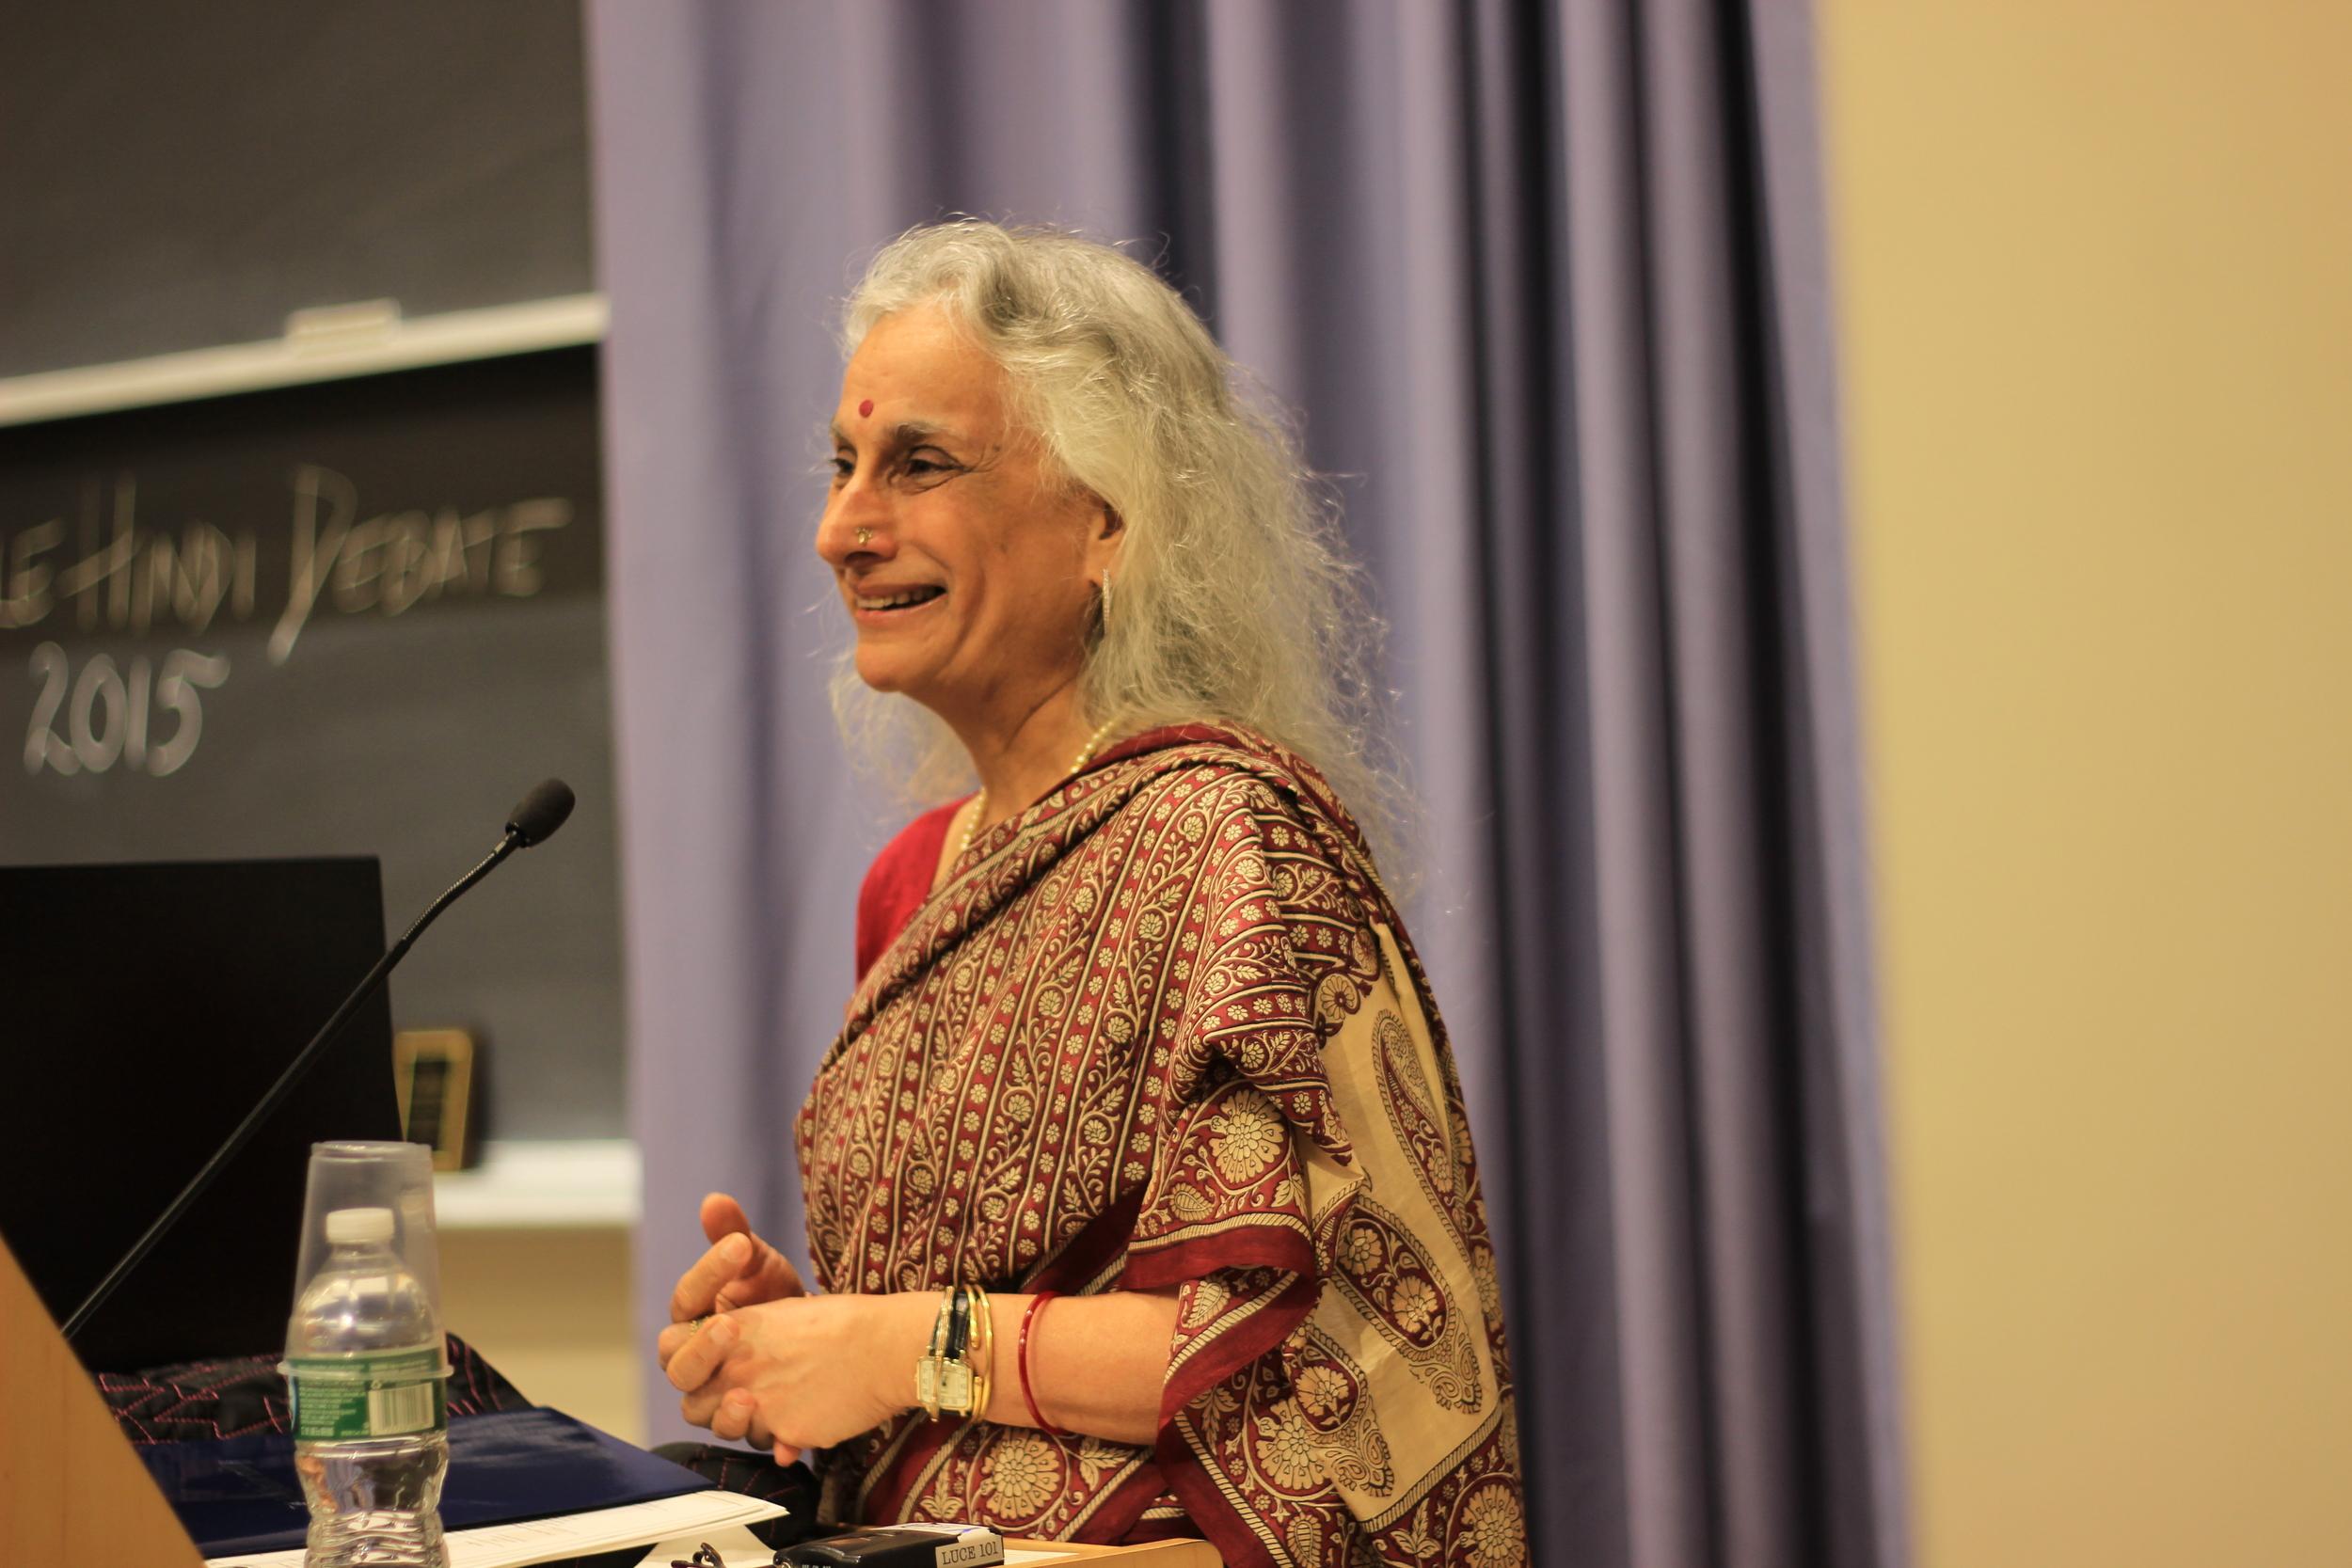 Professor Geetanjali Singh Chanda, Senior Lecturer, WGSS, Yale University; Member of YHD Judging Panel